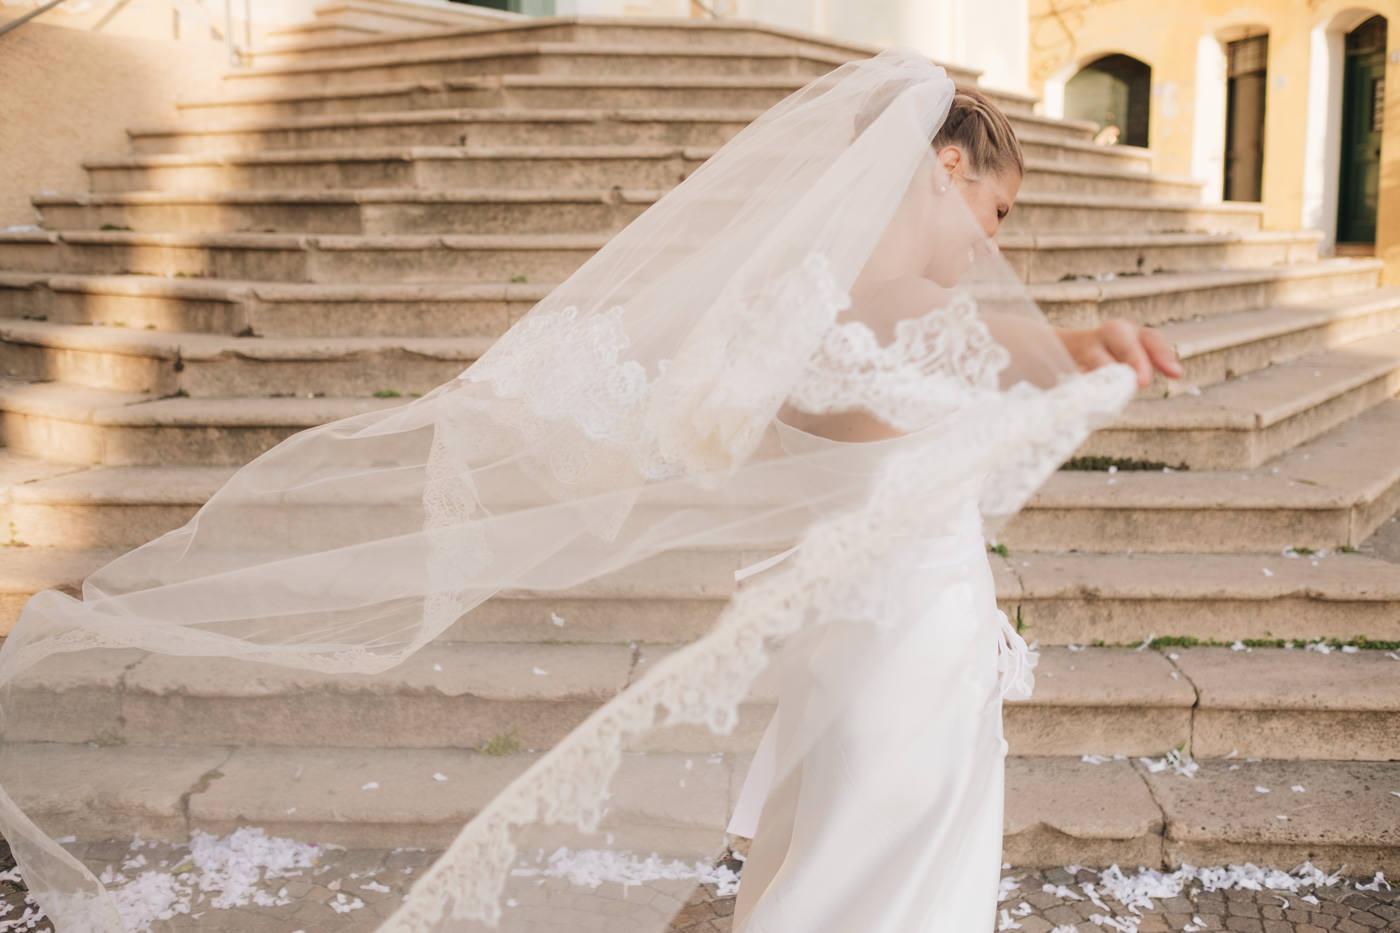 matrimoni_all_italiana_fotografo_matrimonio_cinque_terre-53.jpg